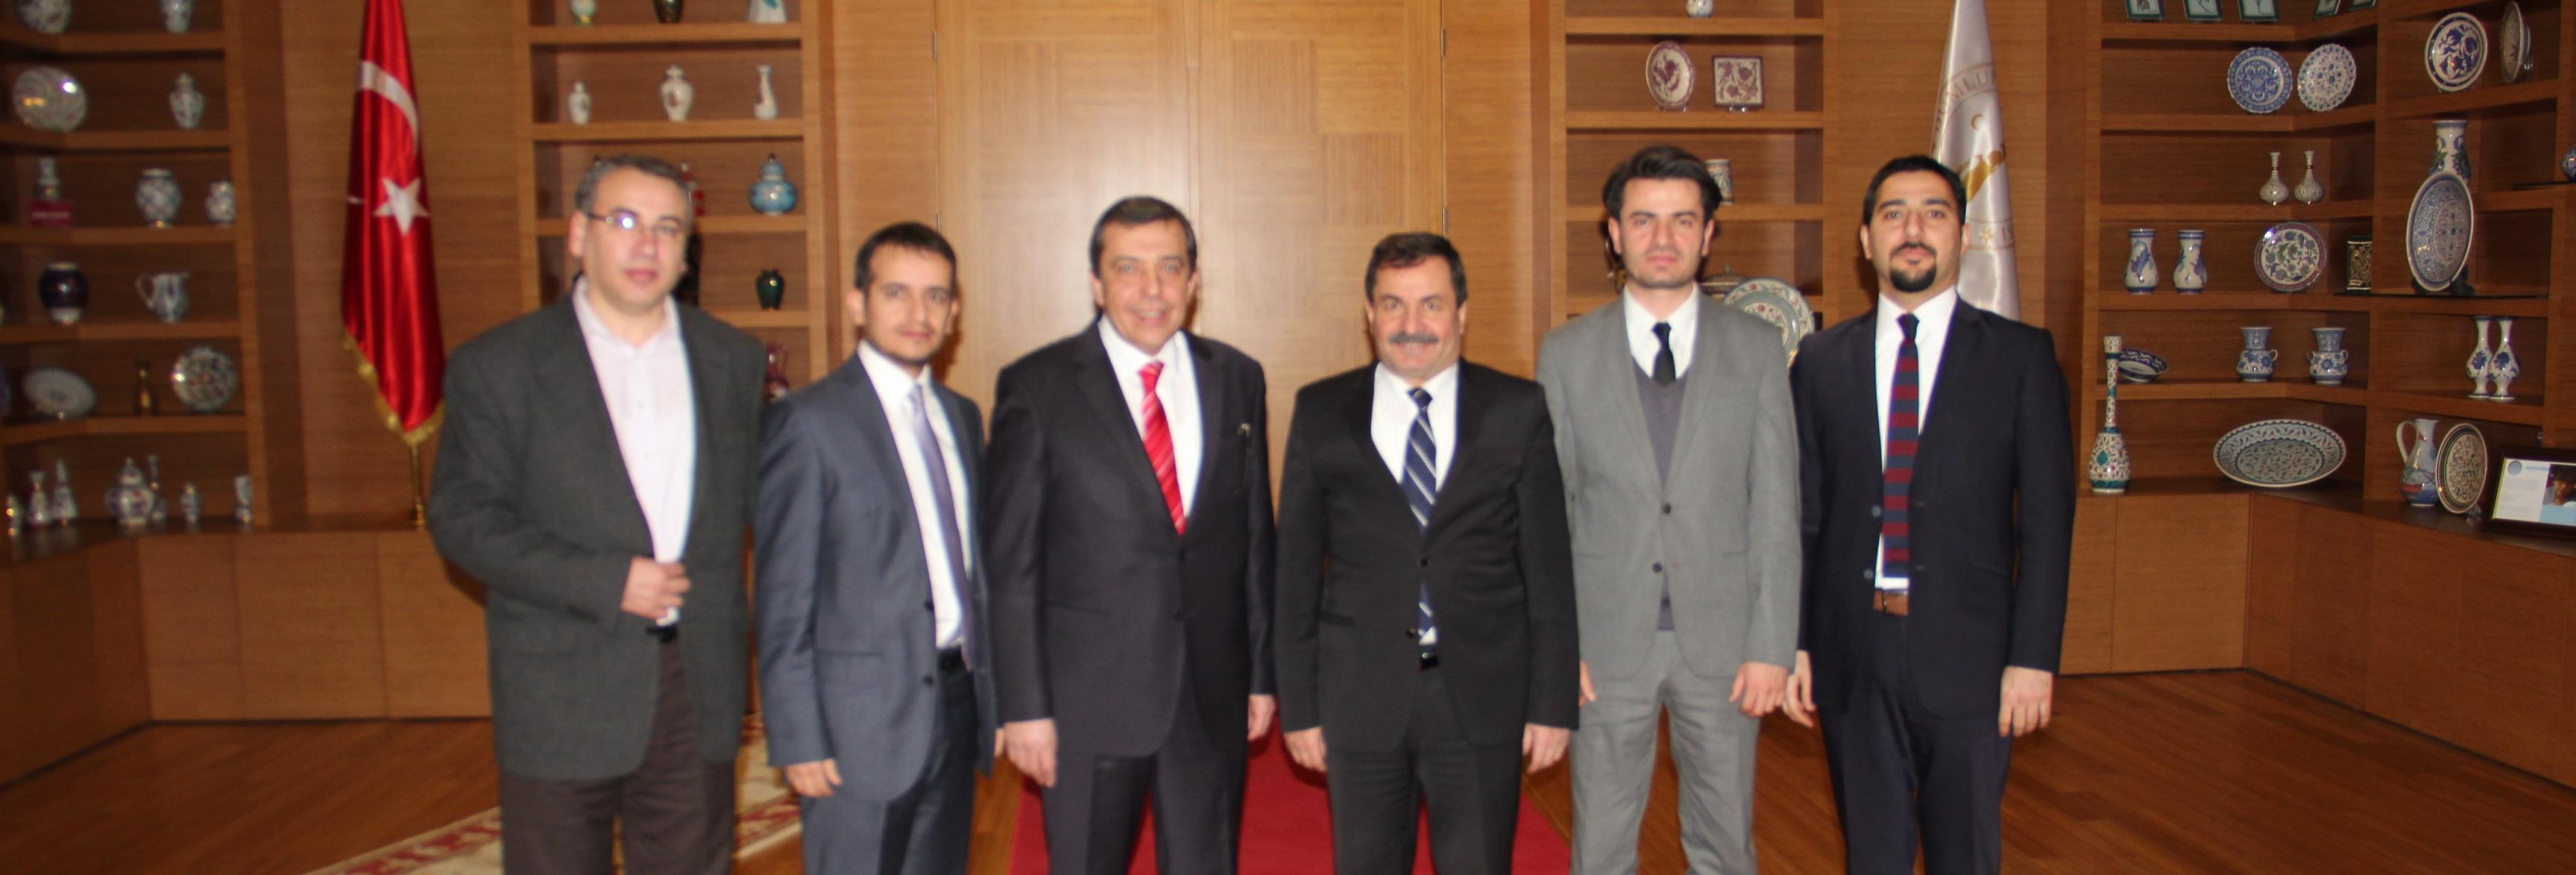 DPÜ REKTÖRÜ SAYIN PROF.DR. AHMET KARAASLAN ZİYARETİ